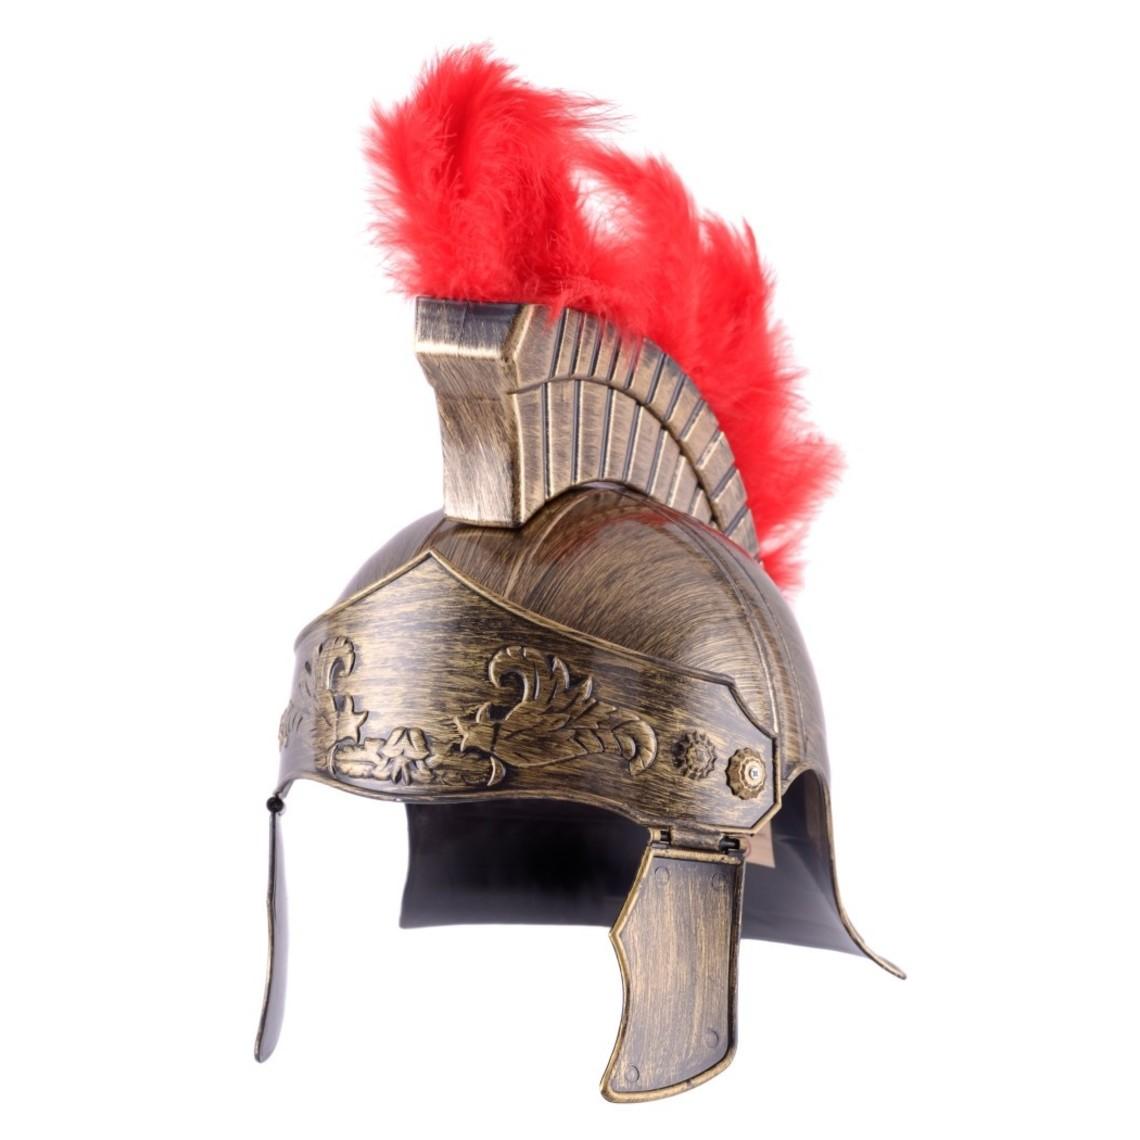 Roman Spielzeug Helm mit rotem Kamm